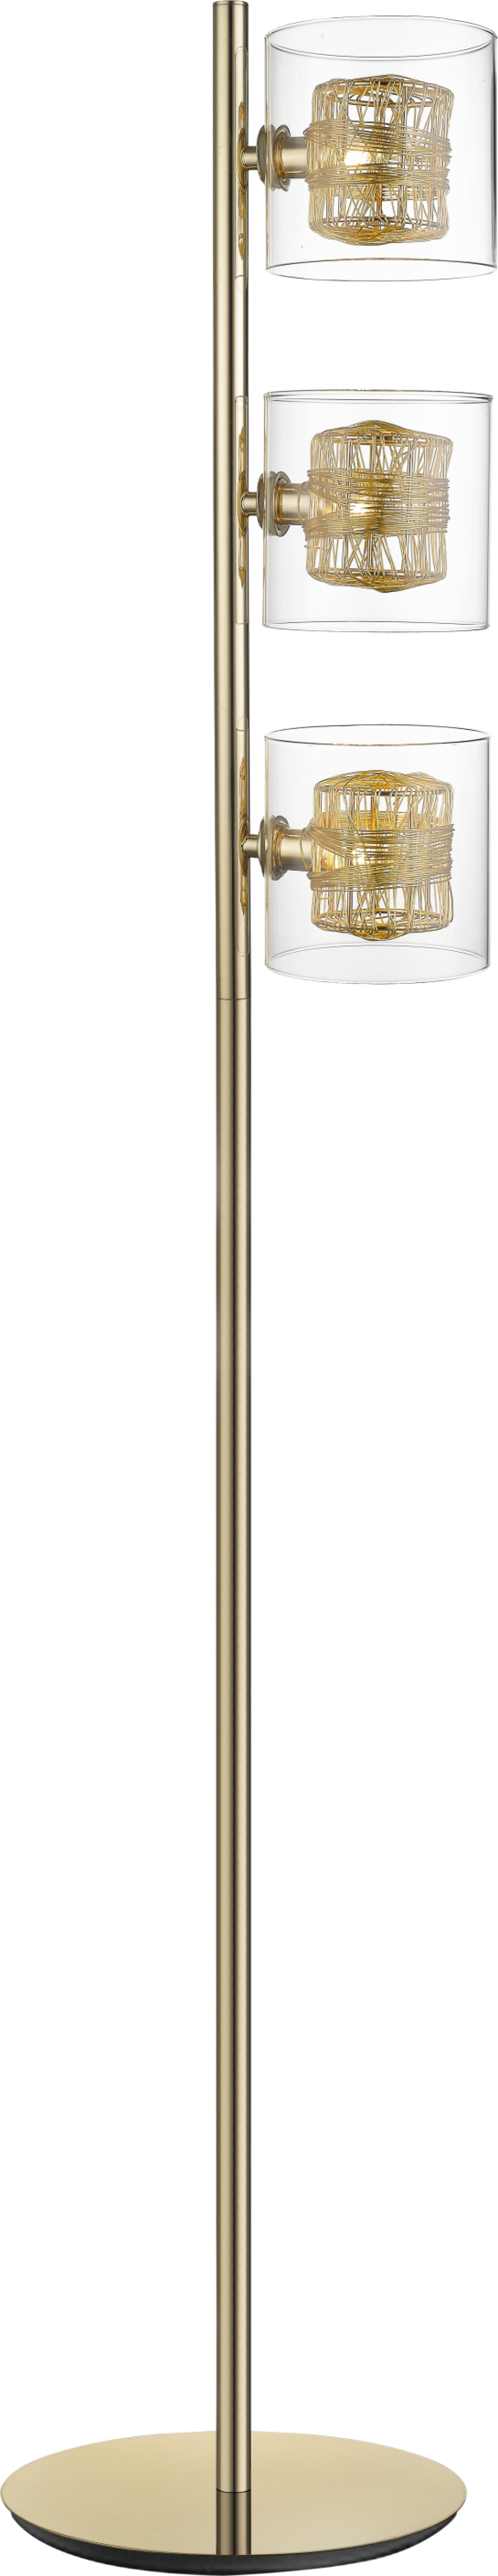 Lampa de podea KLASS auriu H154xL26xW14 cm imagine 2021 insignis.ro